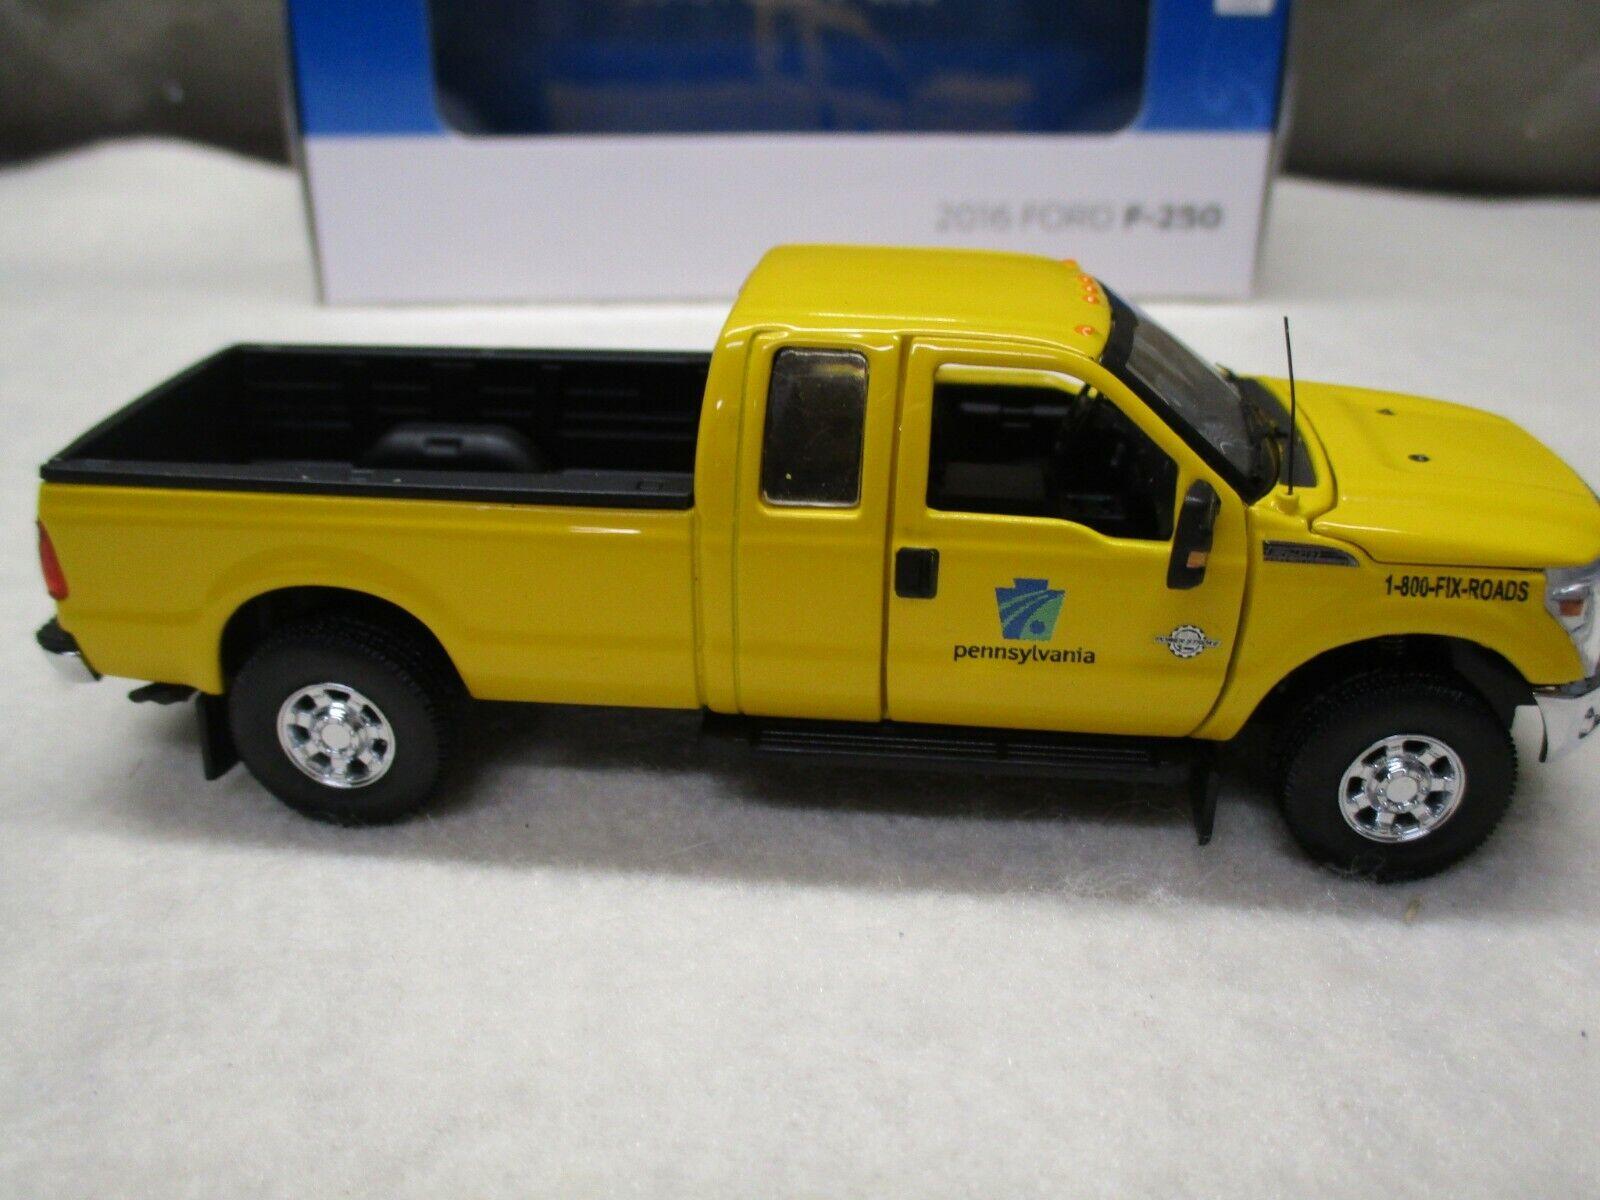 SWORD 2016 Ford F250 PennDot Gelb Pickup Truck Super Cab 8 ft bed 1 50 NIB